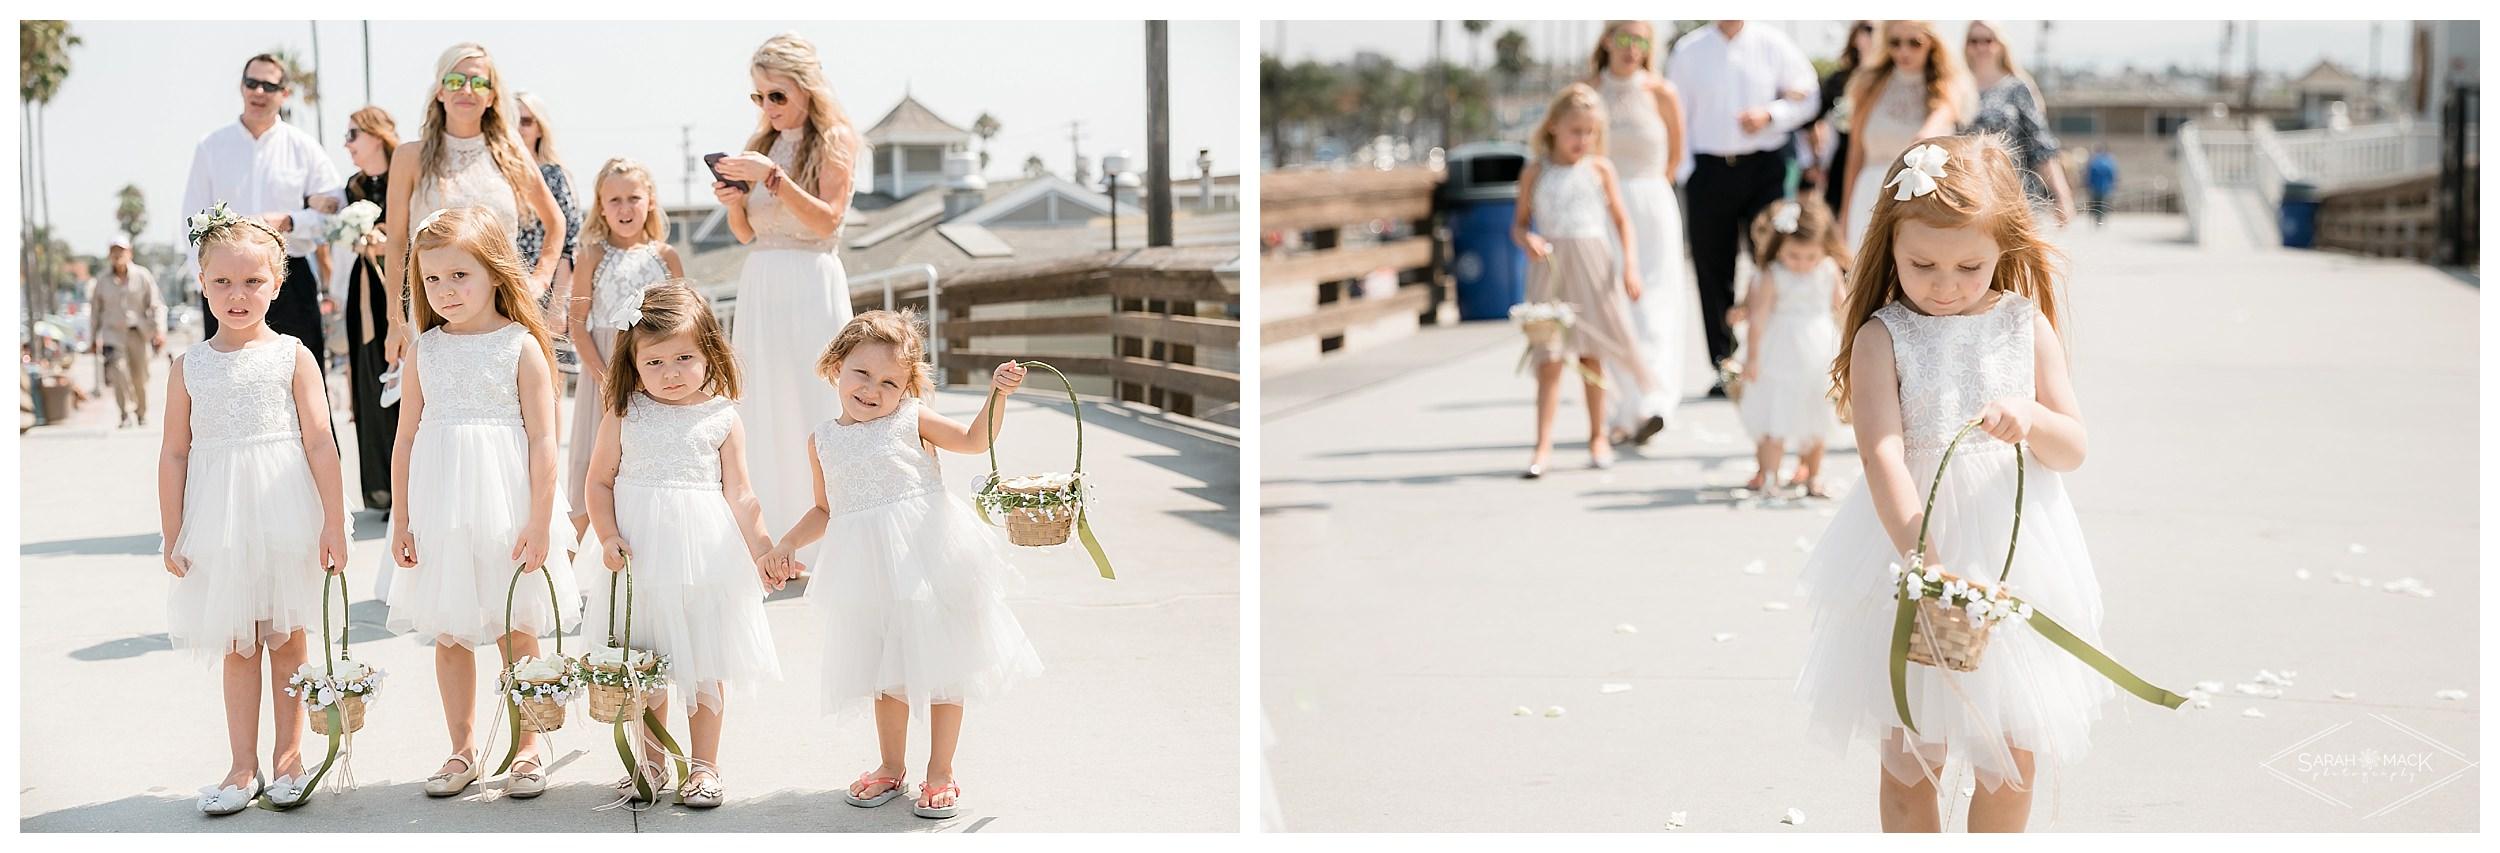 LM-Newport-Beach-Pier-Intimate-Wedding-Photography 52.jpg